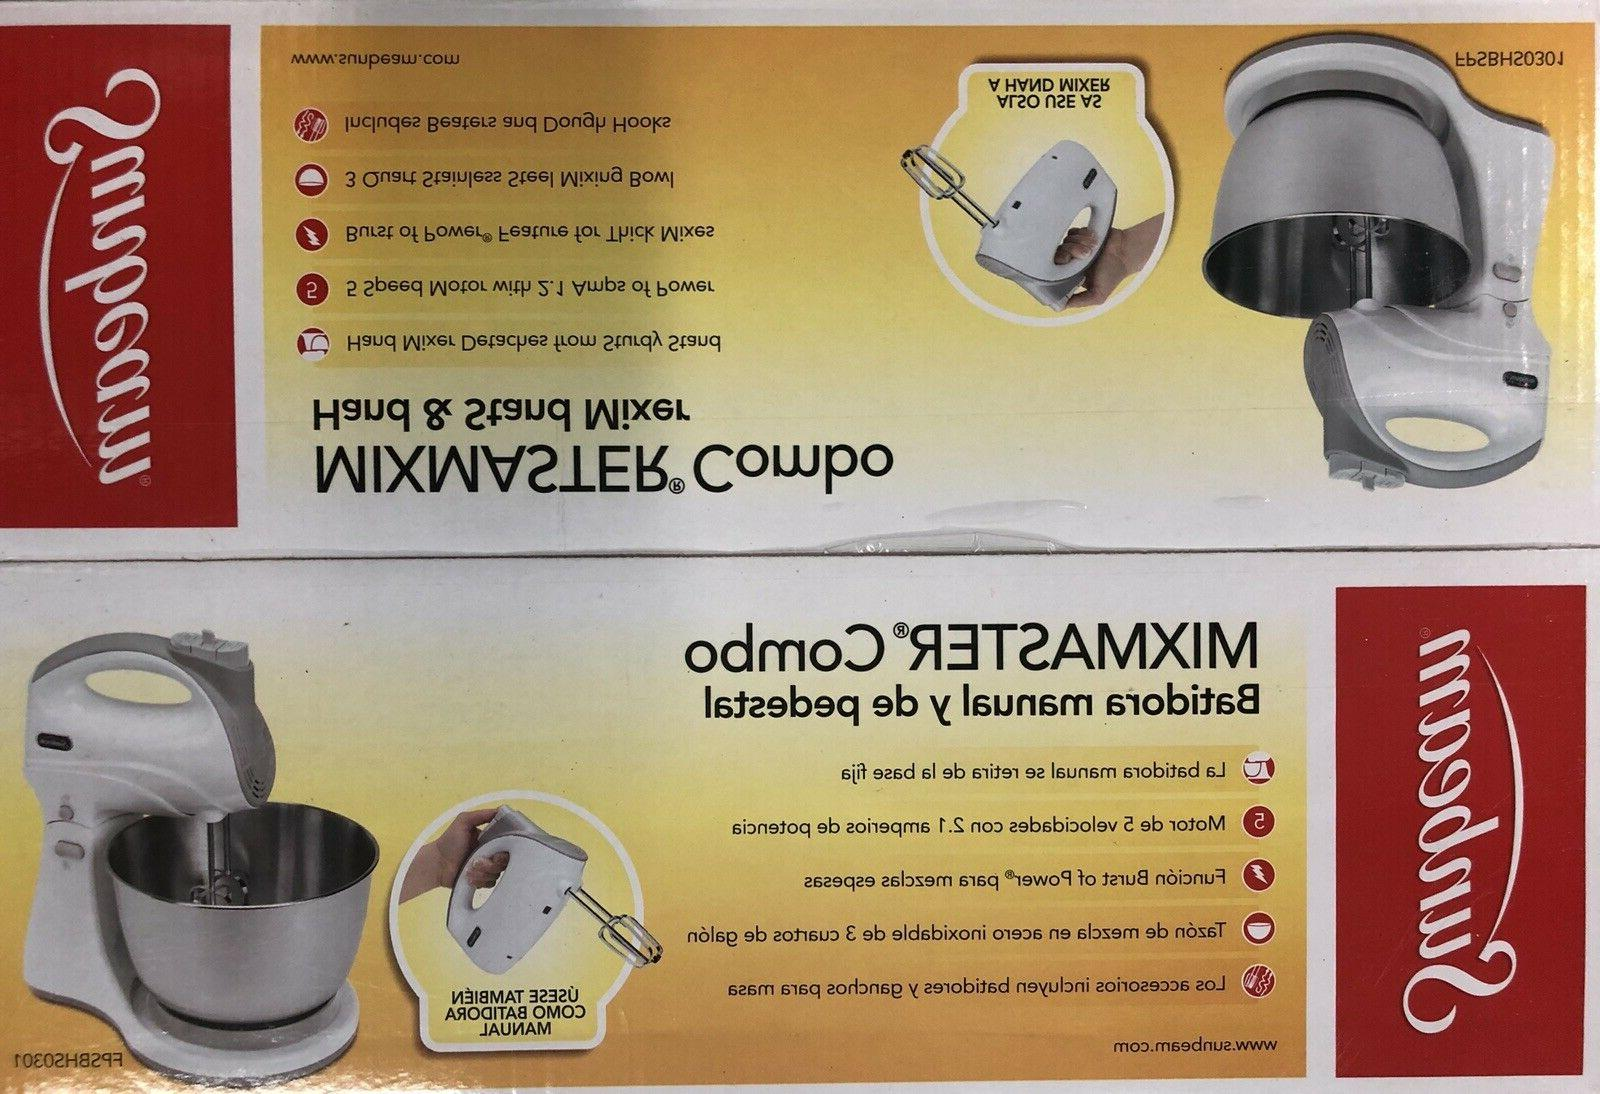 Sunbeam Mixmaster 250-W, Combo Hand/Stand Bowl. White or